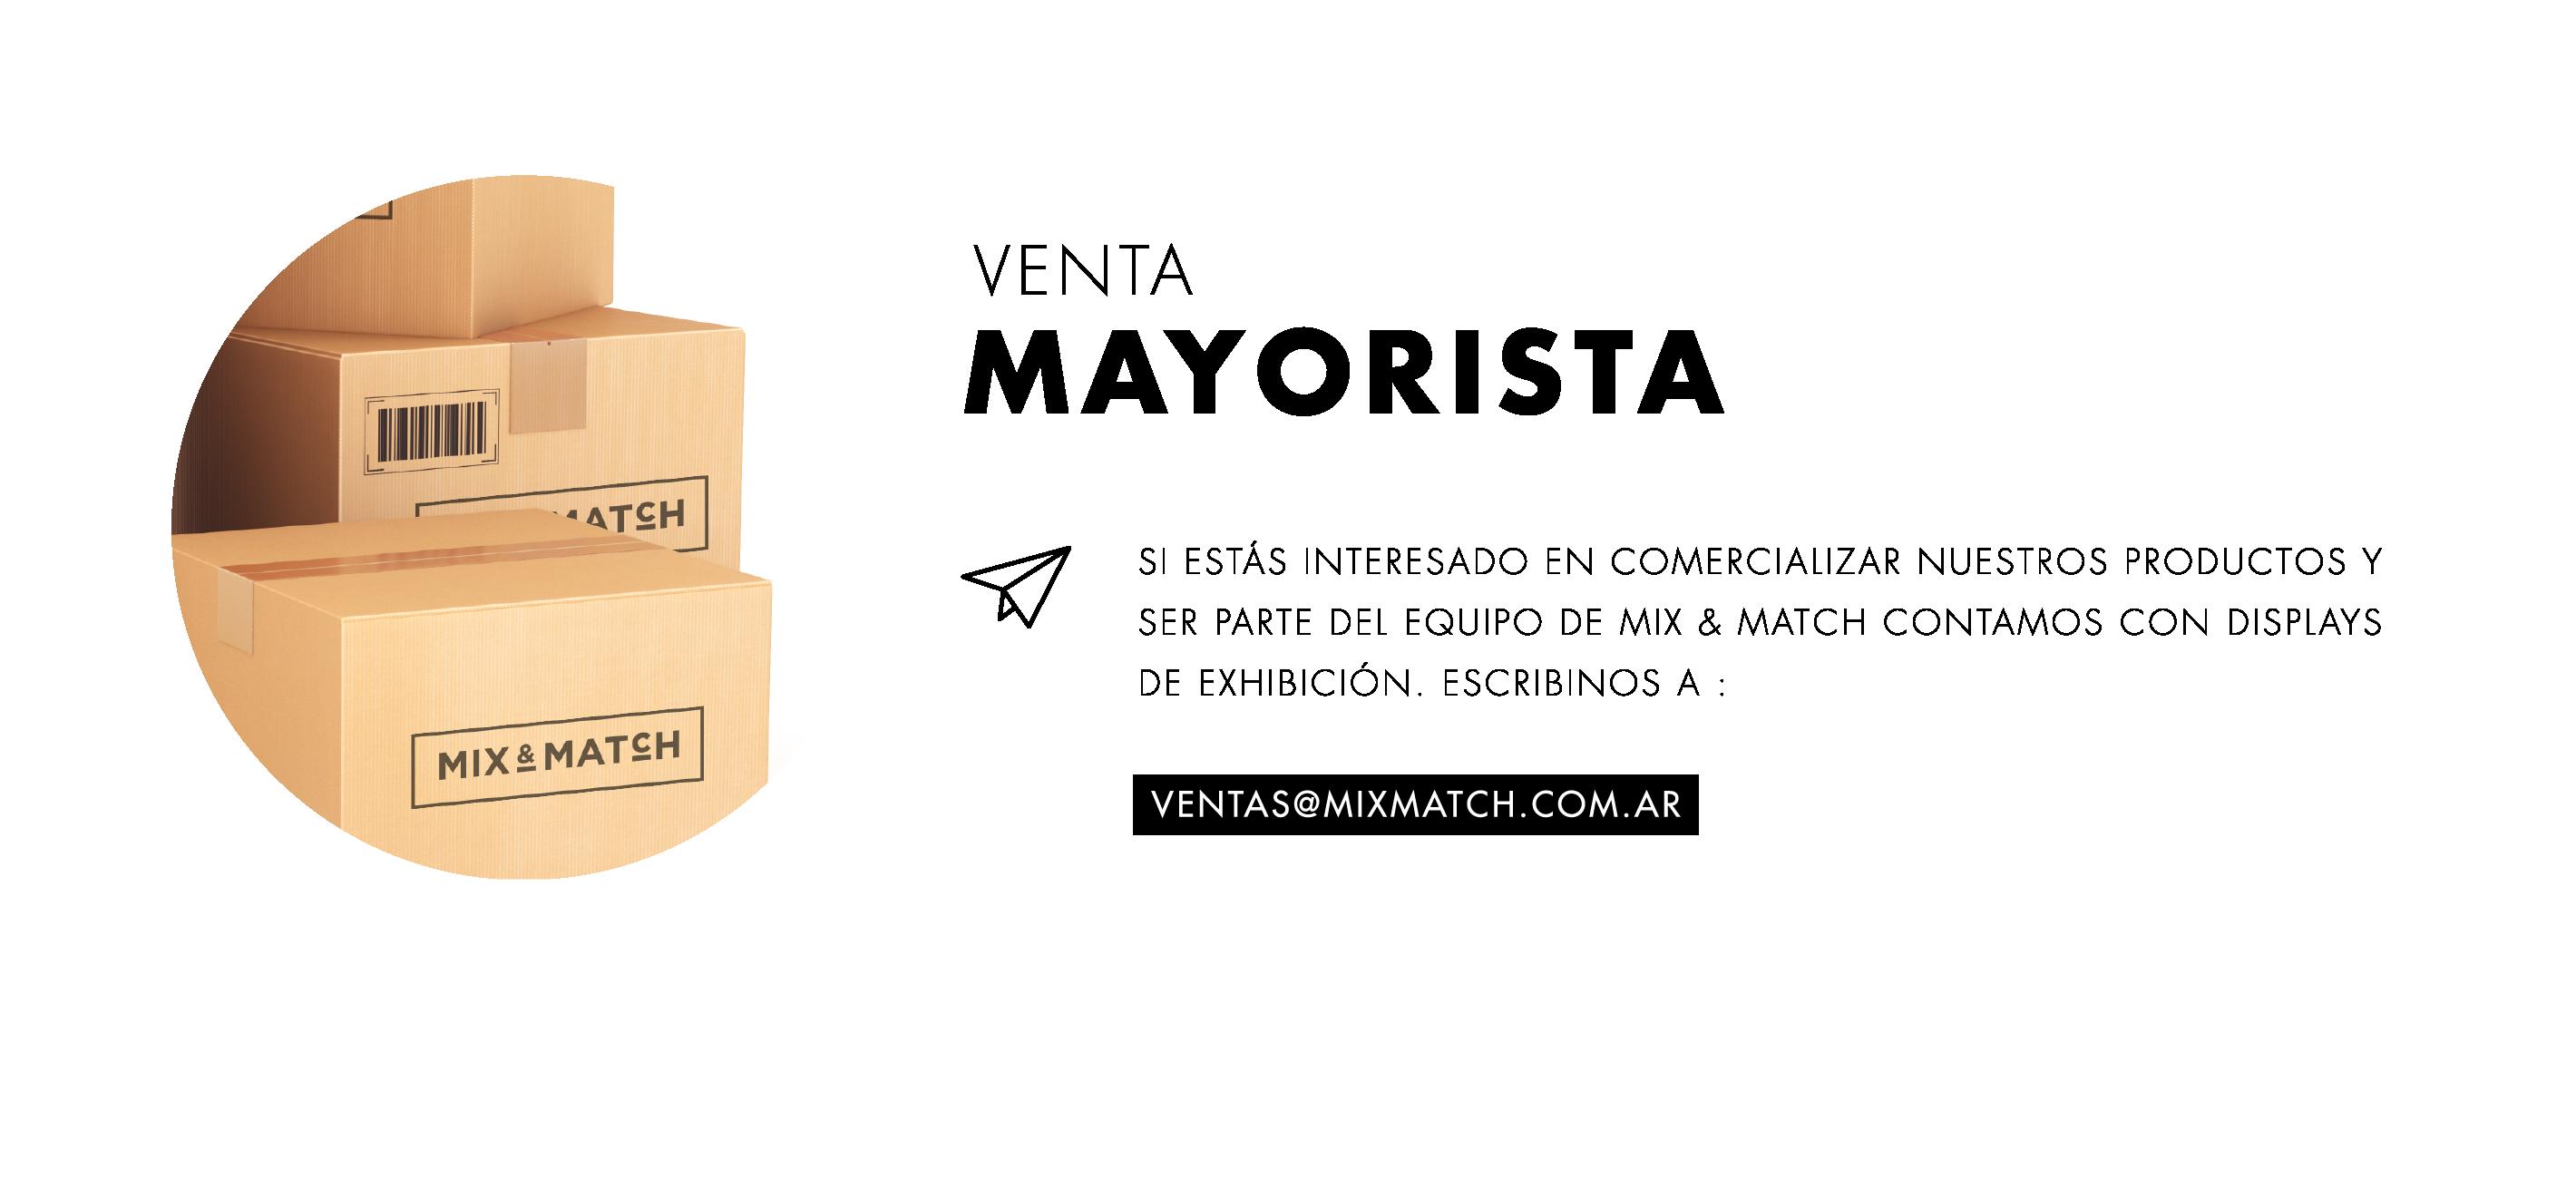 Tienda Online de Mix Match - Venta Mayorista 3275960a00f7a